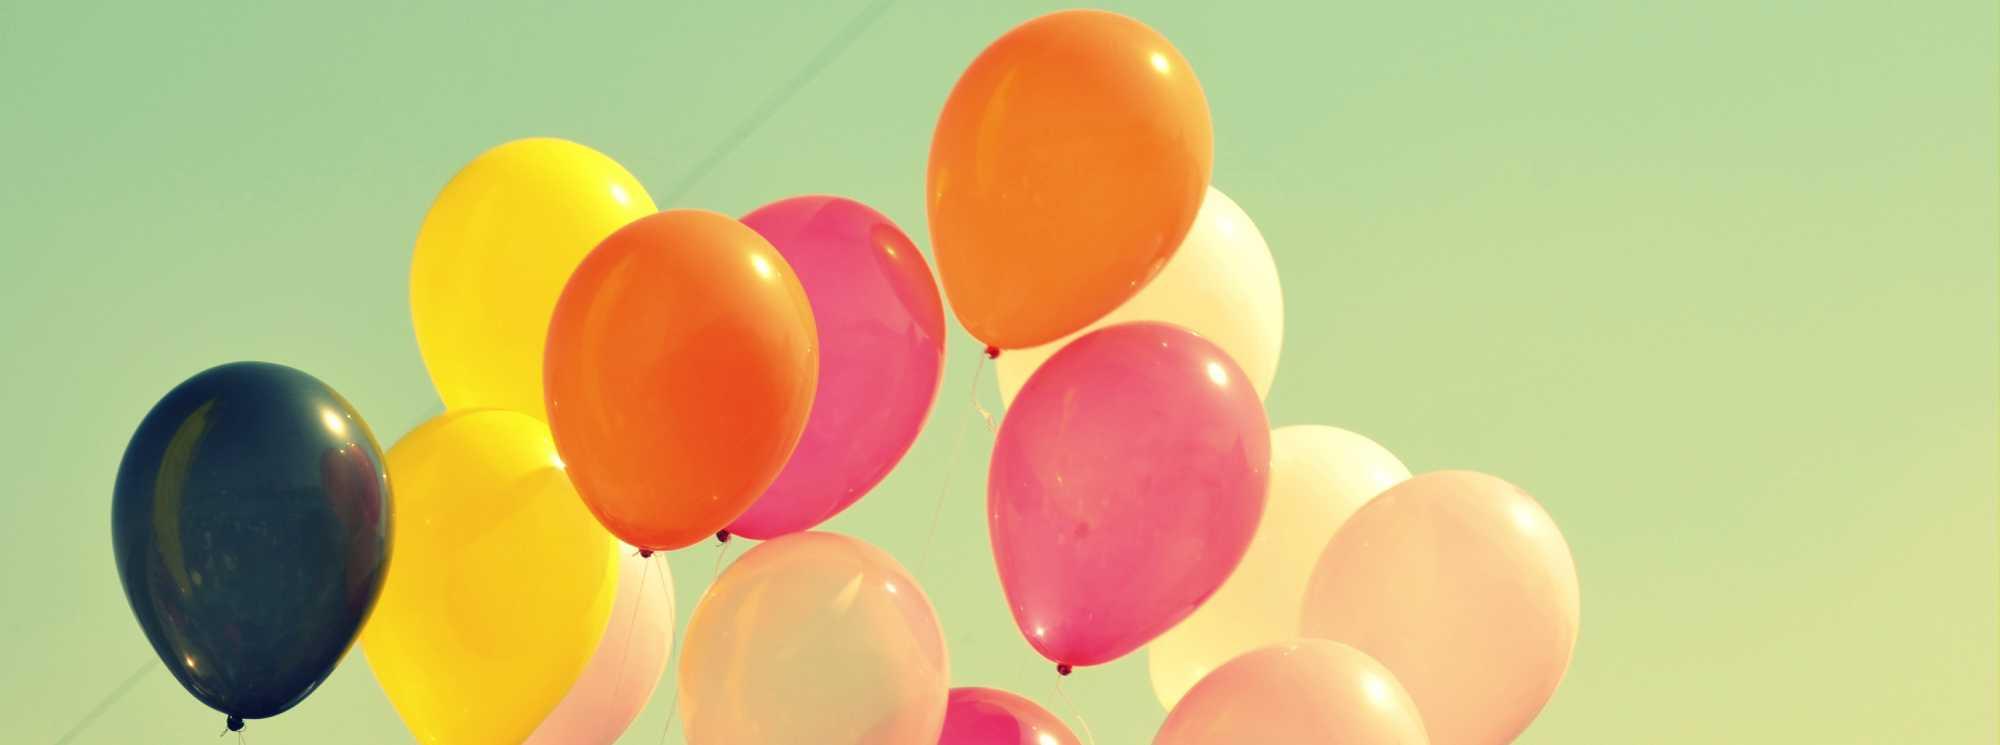 Kleurrijke balonnen in de lucht